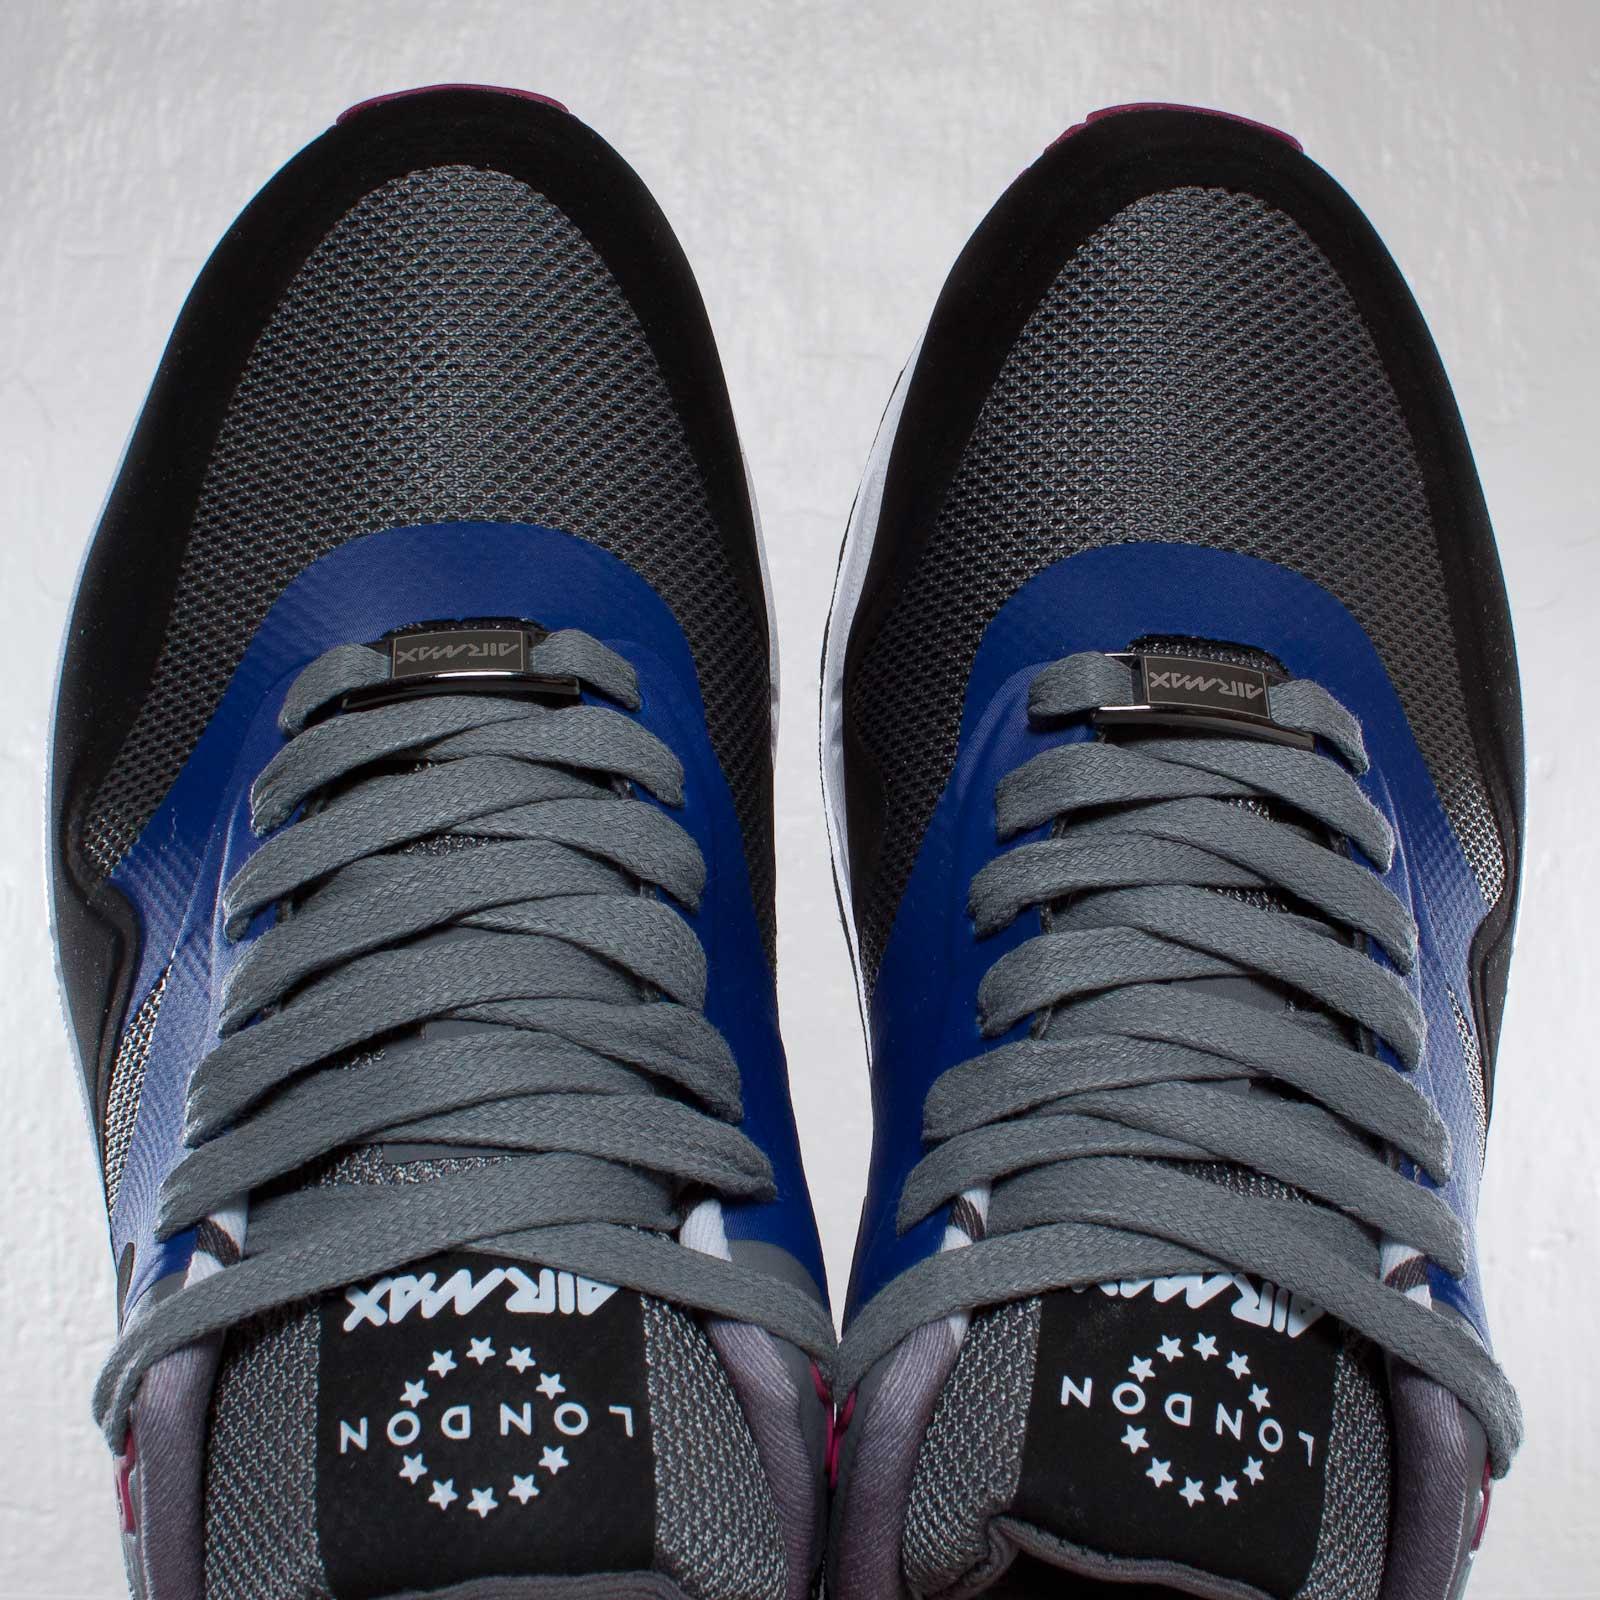 Nike Air Max 1 London QS 587921 005 Sneakersnstuff